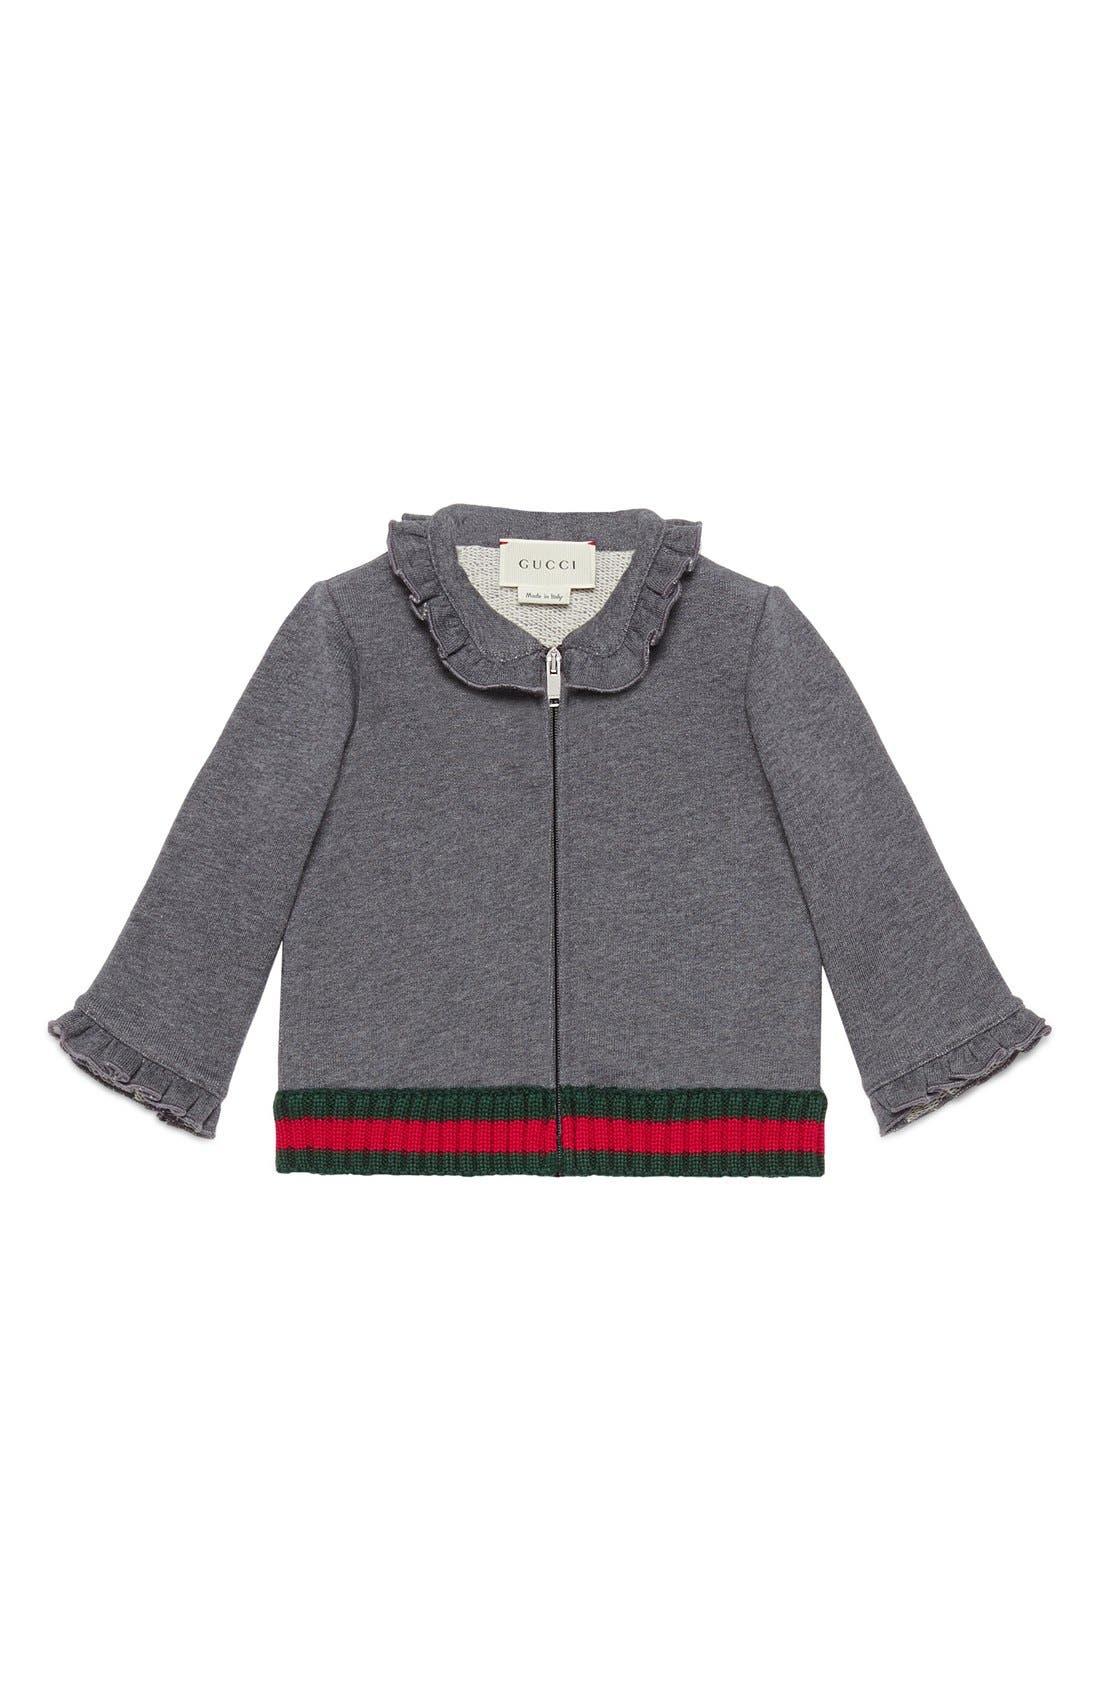 Gucci Ruffle Full Zip Sweater (Baby Girls & Toddler Girls)